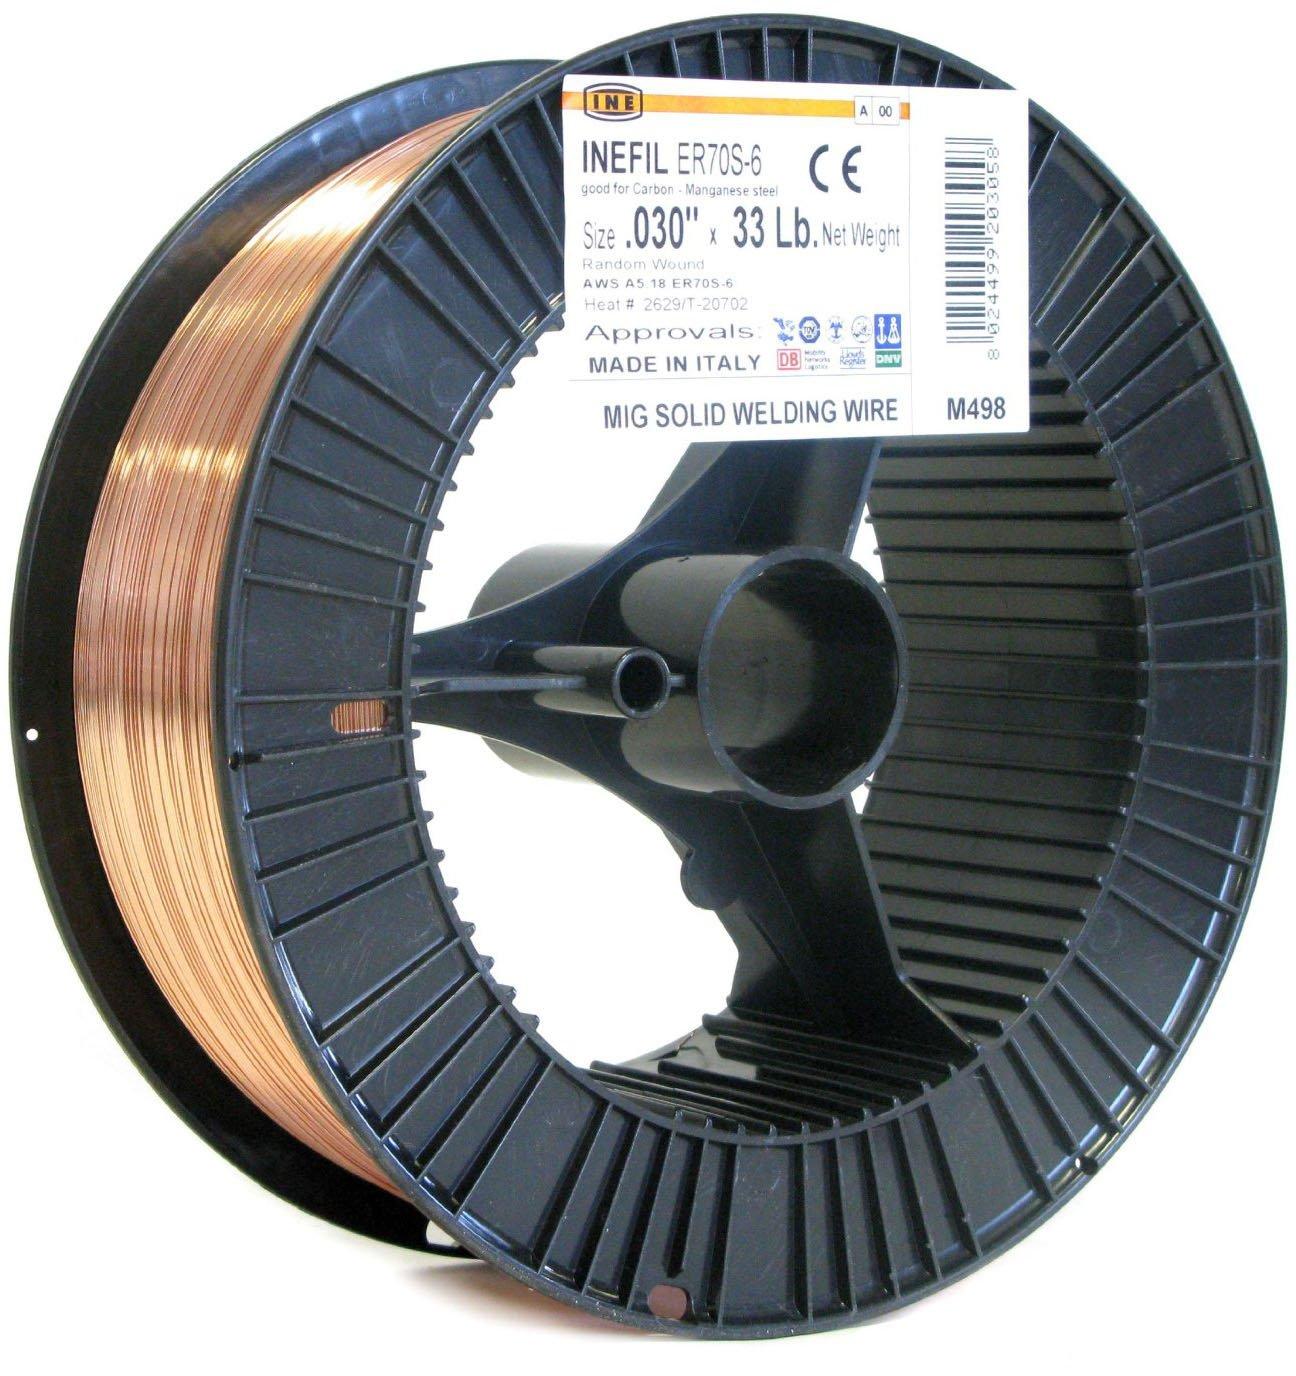 INEFIL ER70S-6 .030-Inch on 33-Pound Spool Random Wound Carbon Steel Mig Solid Welding Wire INE USA 8024499203058